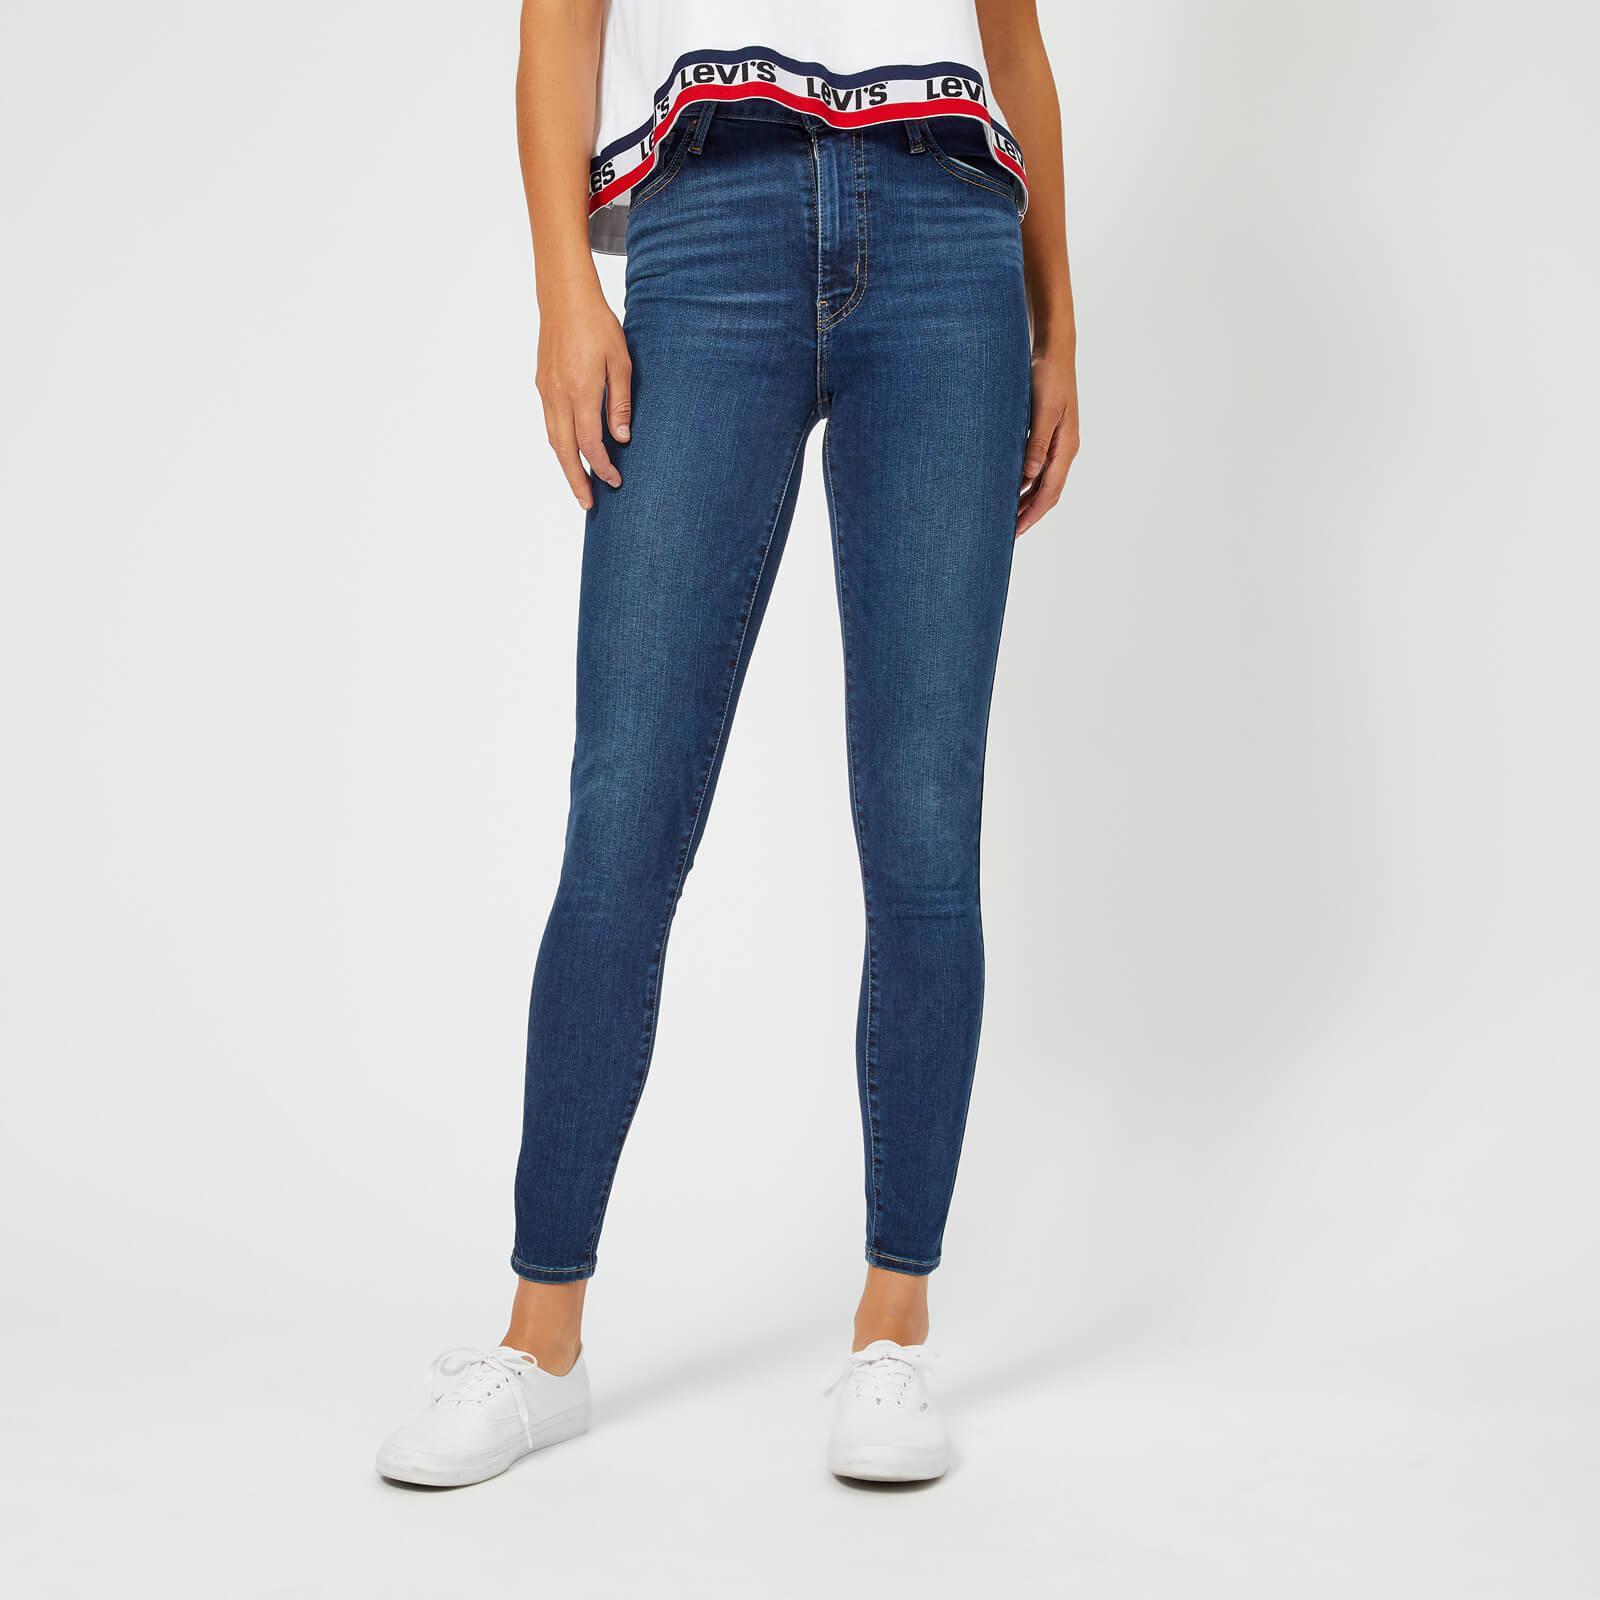 High Super In Mile Lyst Jeans Blue Levi's Skinny 5E1xqX88nZ